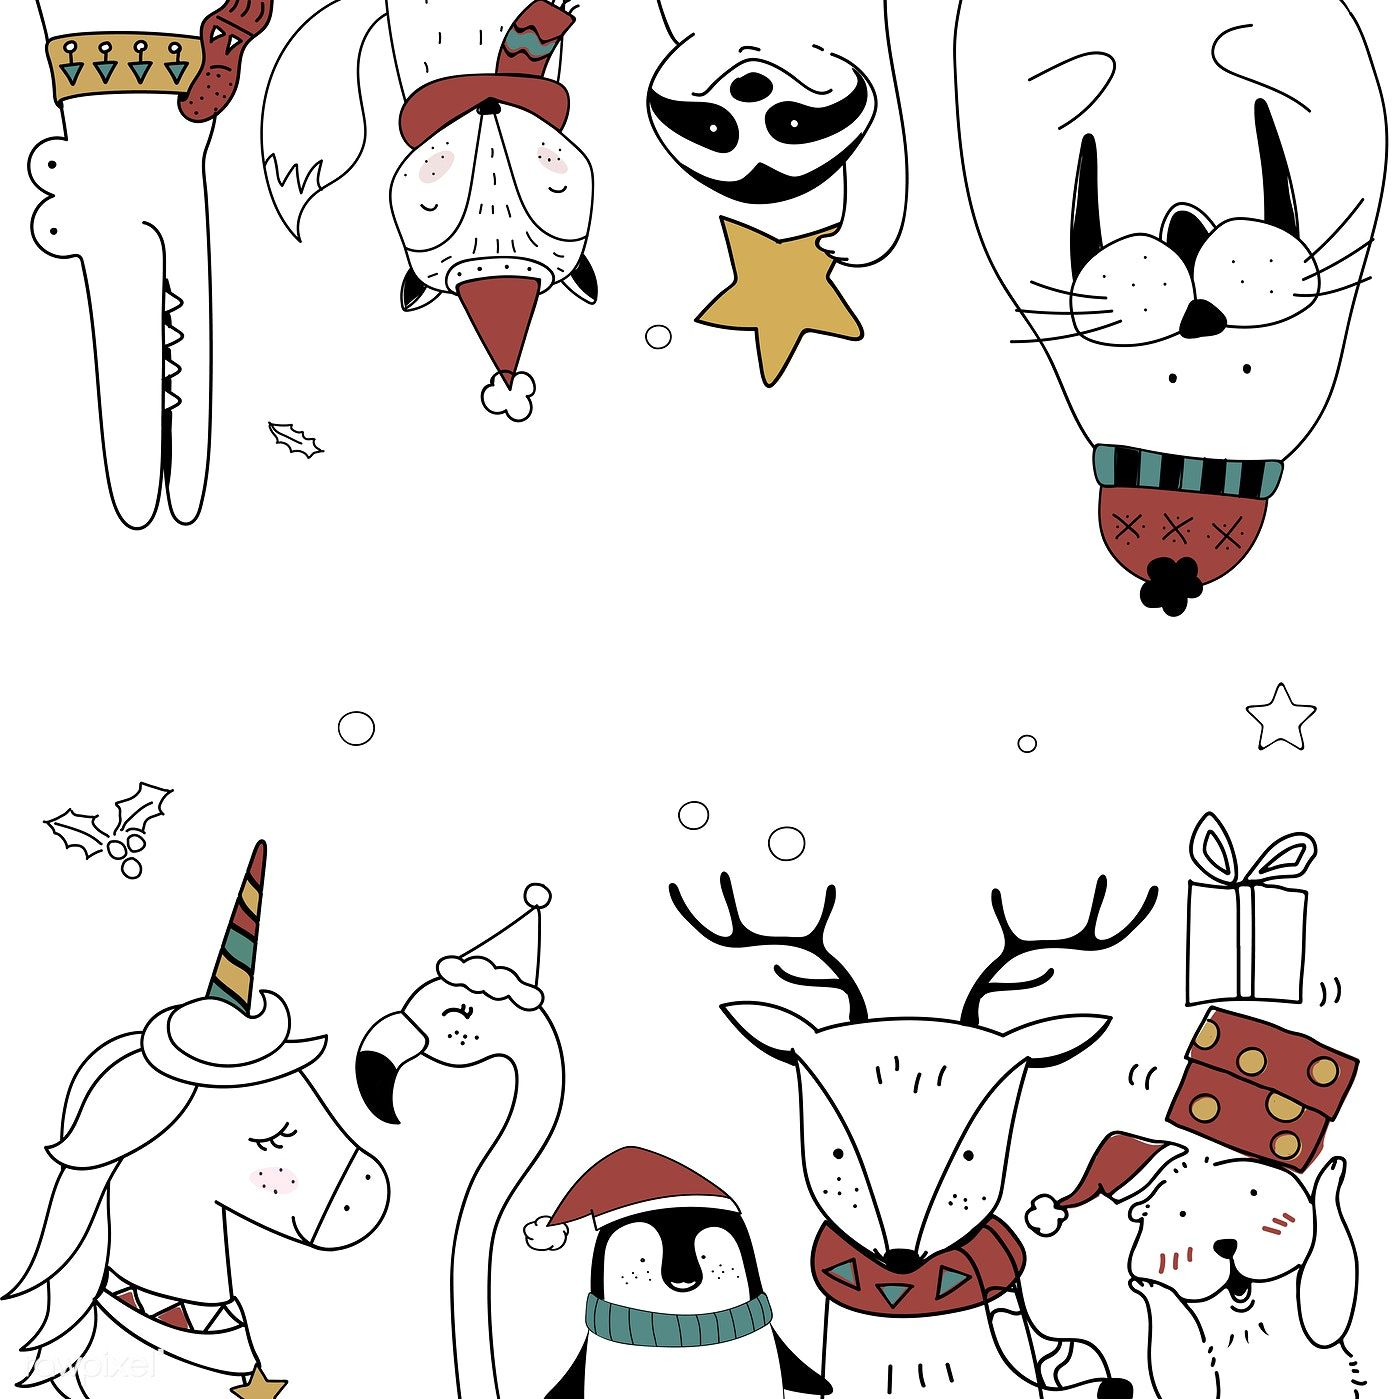 Download premium vector of Hand drawn animals enjoying a